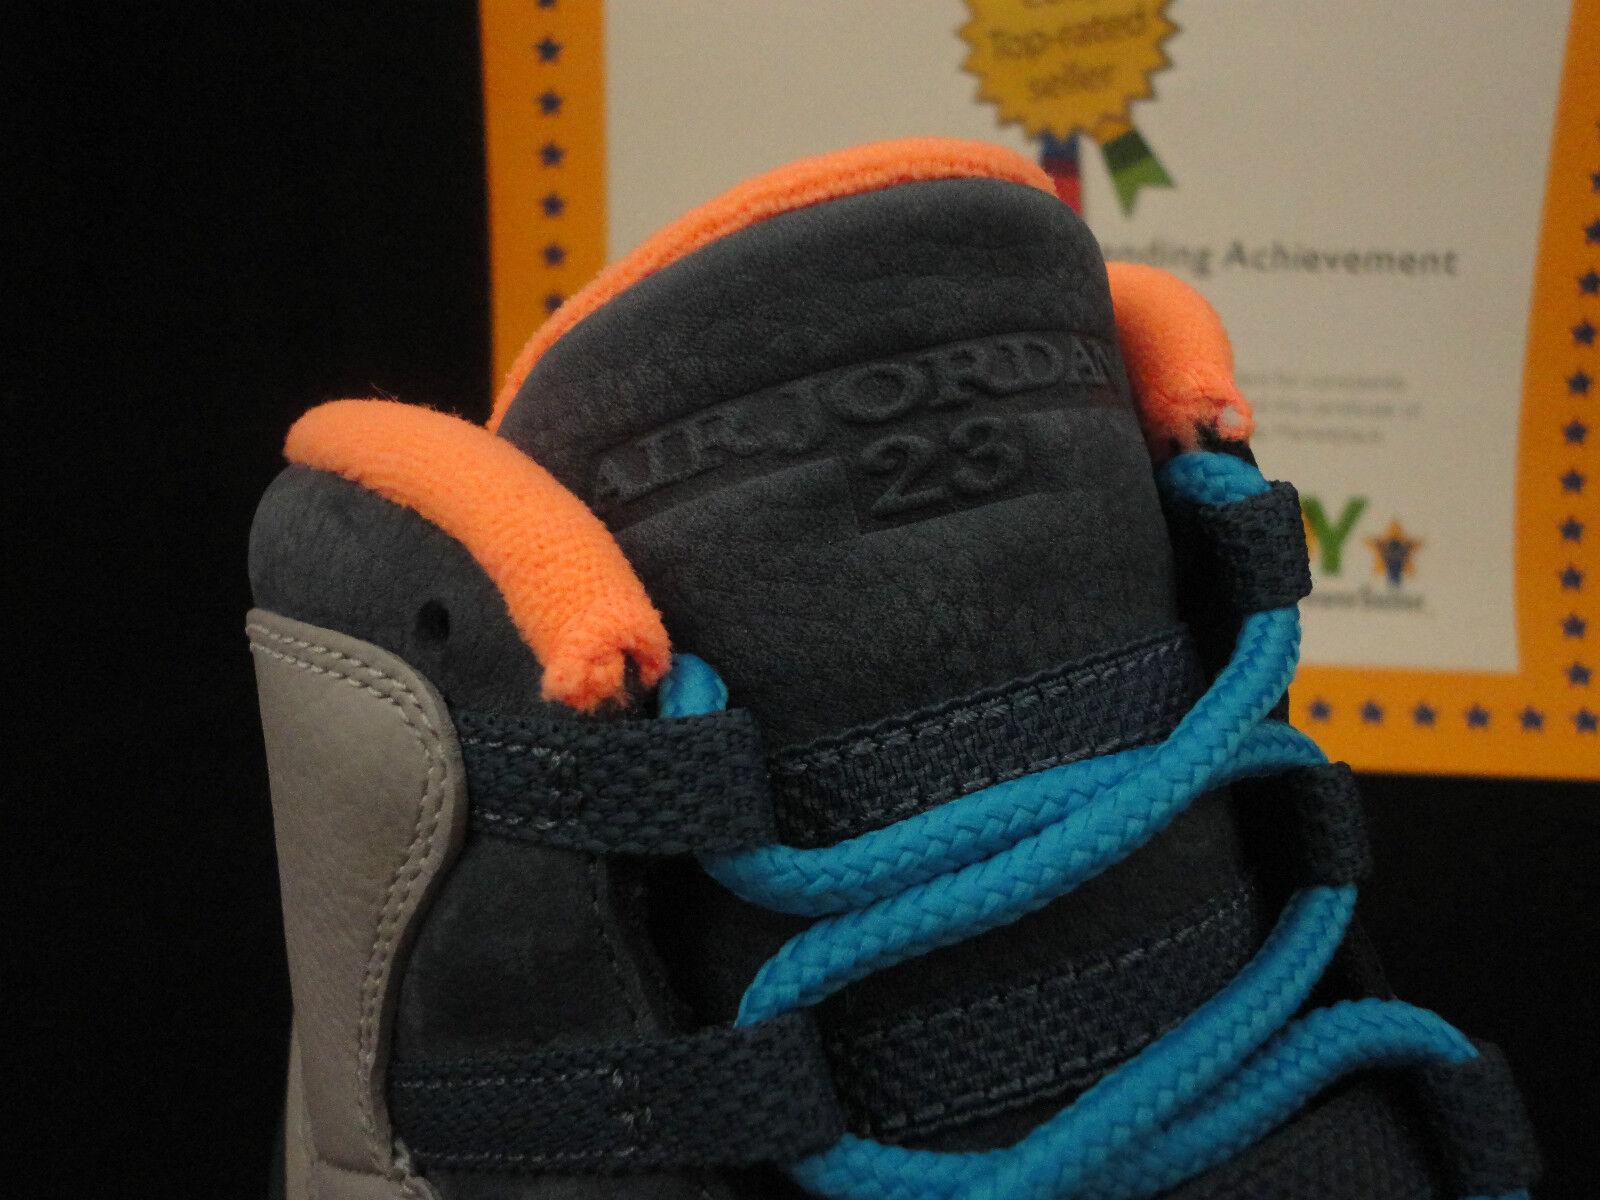 Nike Air Jordan Retro 10 X, Bobcats, Size 8